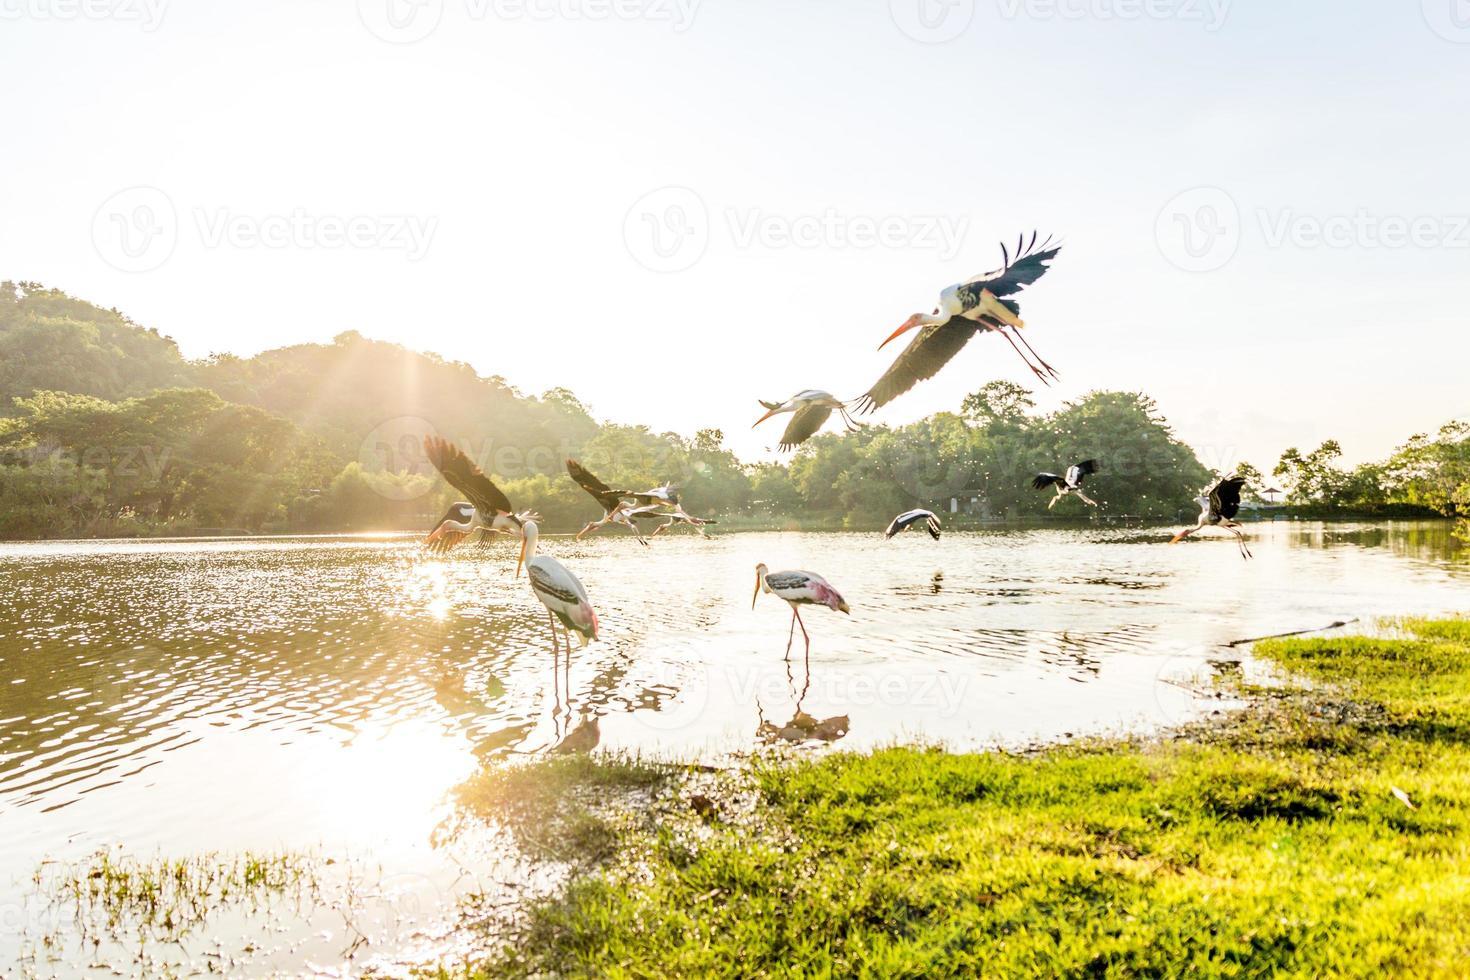 Bird in wild life photo